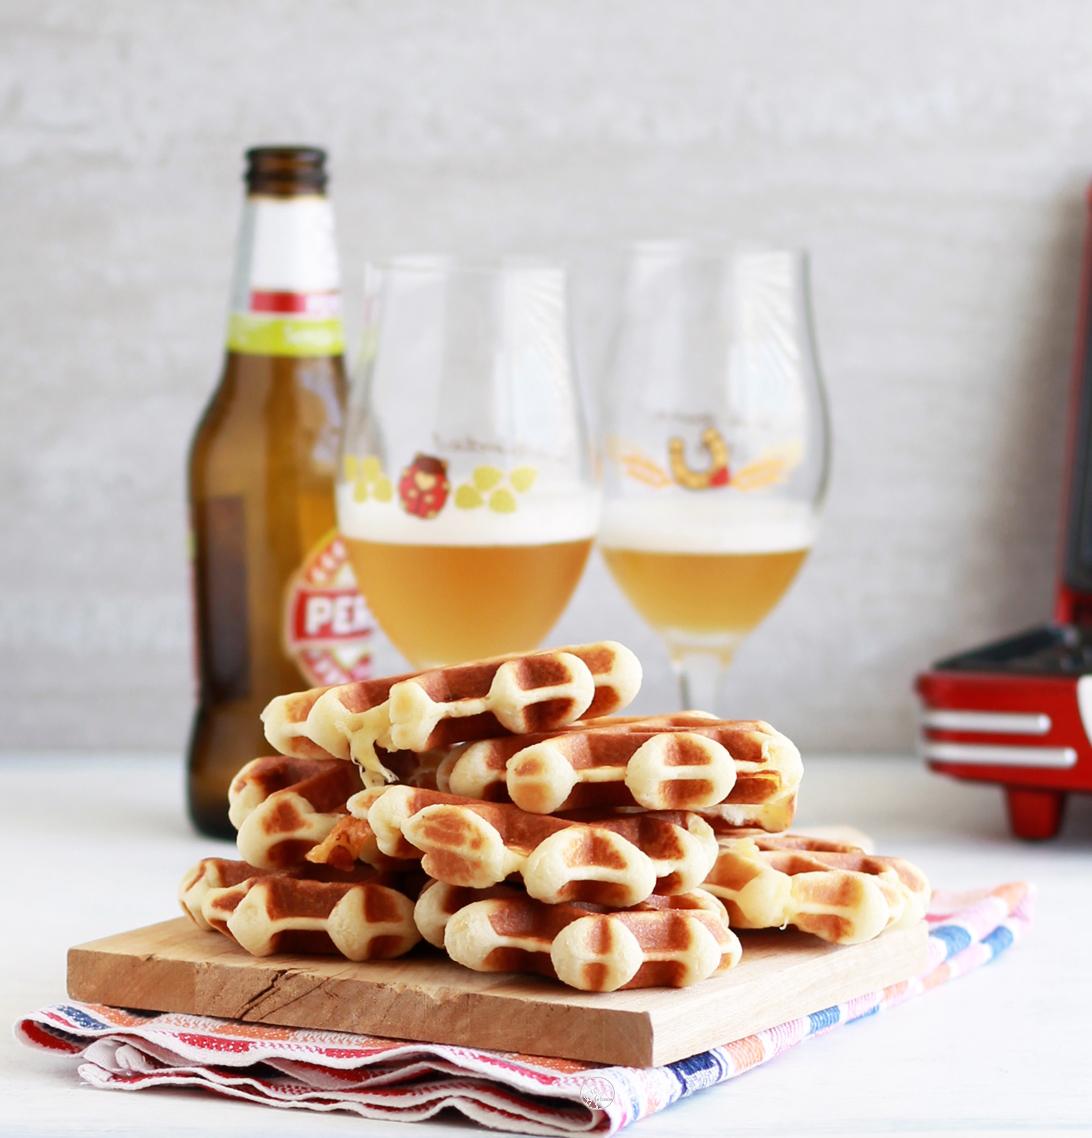 Gaufres di Liegi senza glutine - La Cassata Celiaca